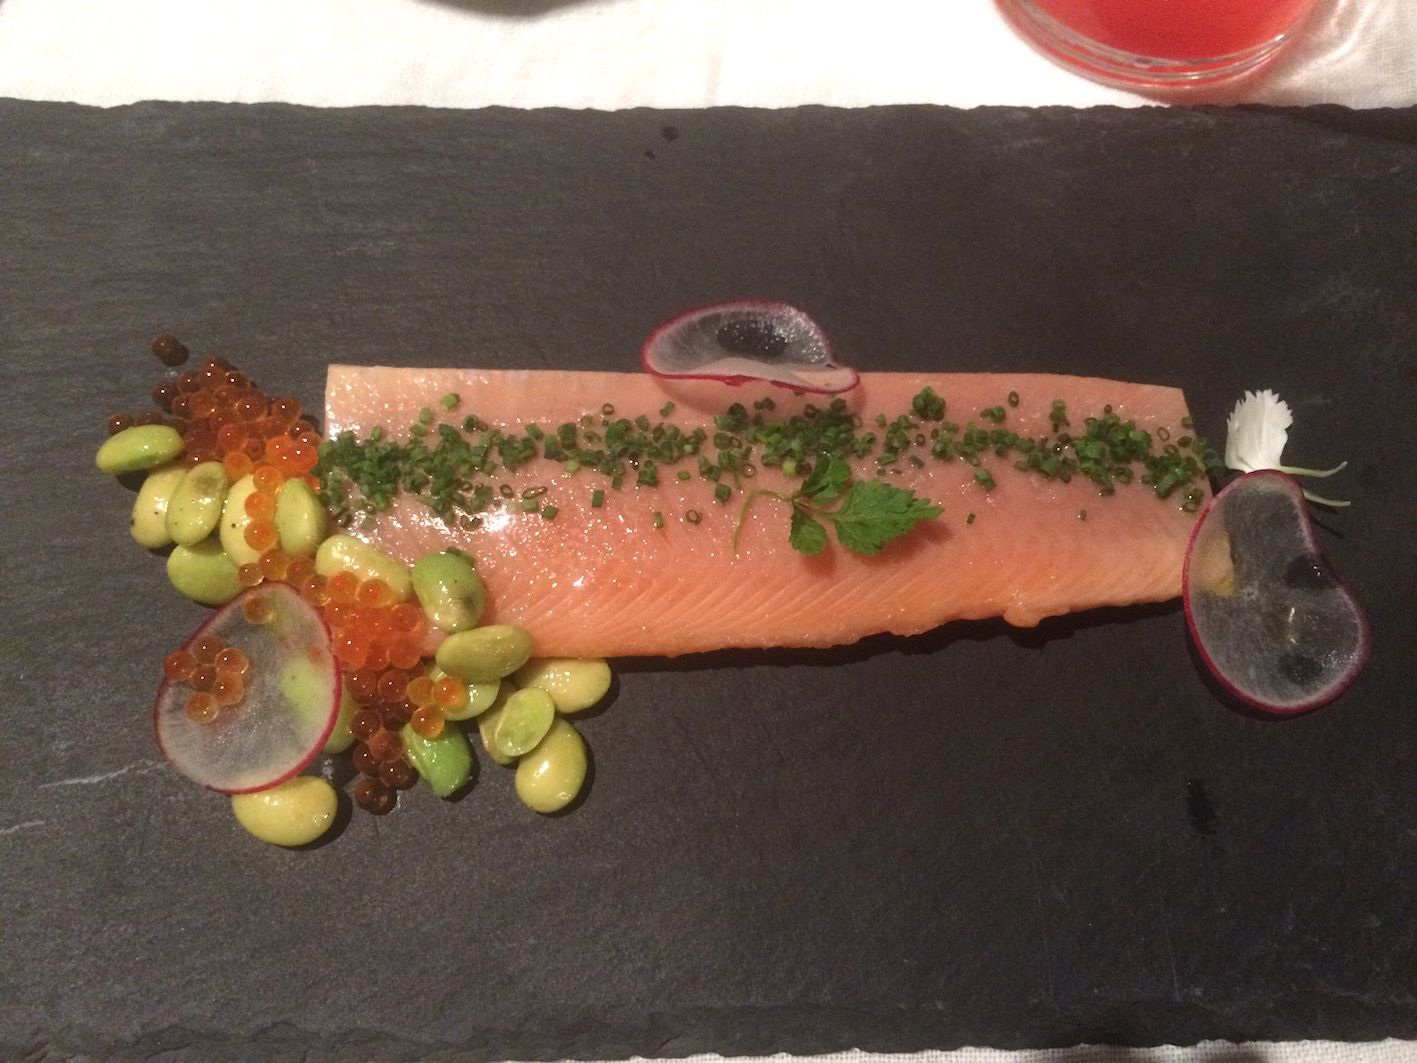 Delicately smoked trout at Bella Riva Hotel, Gardone Riviera, Italy